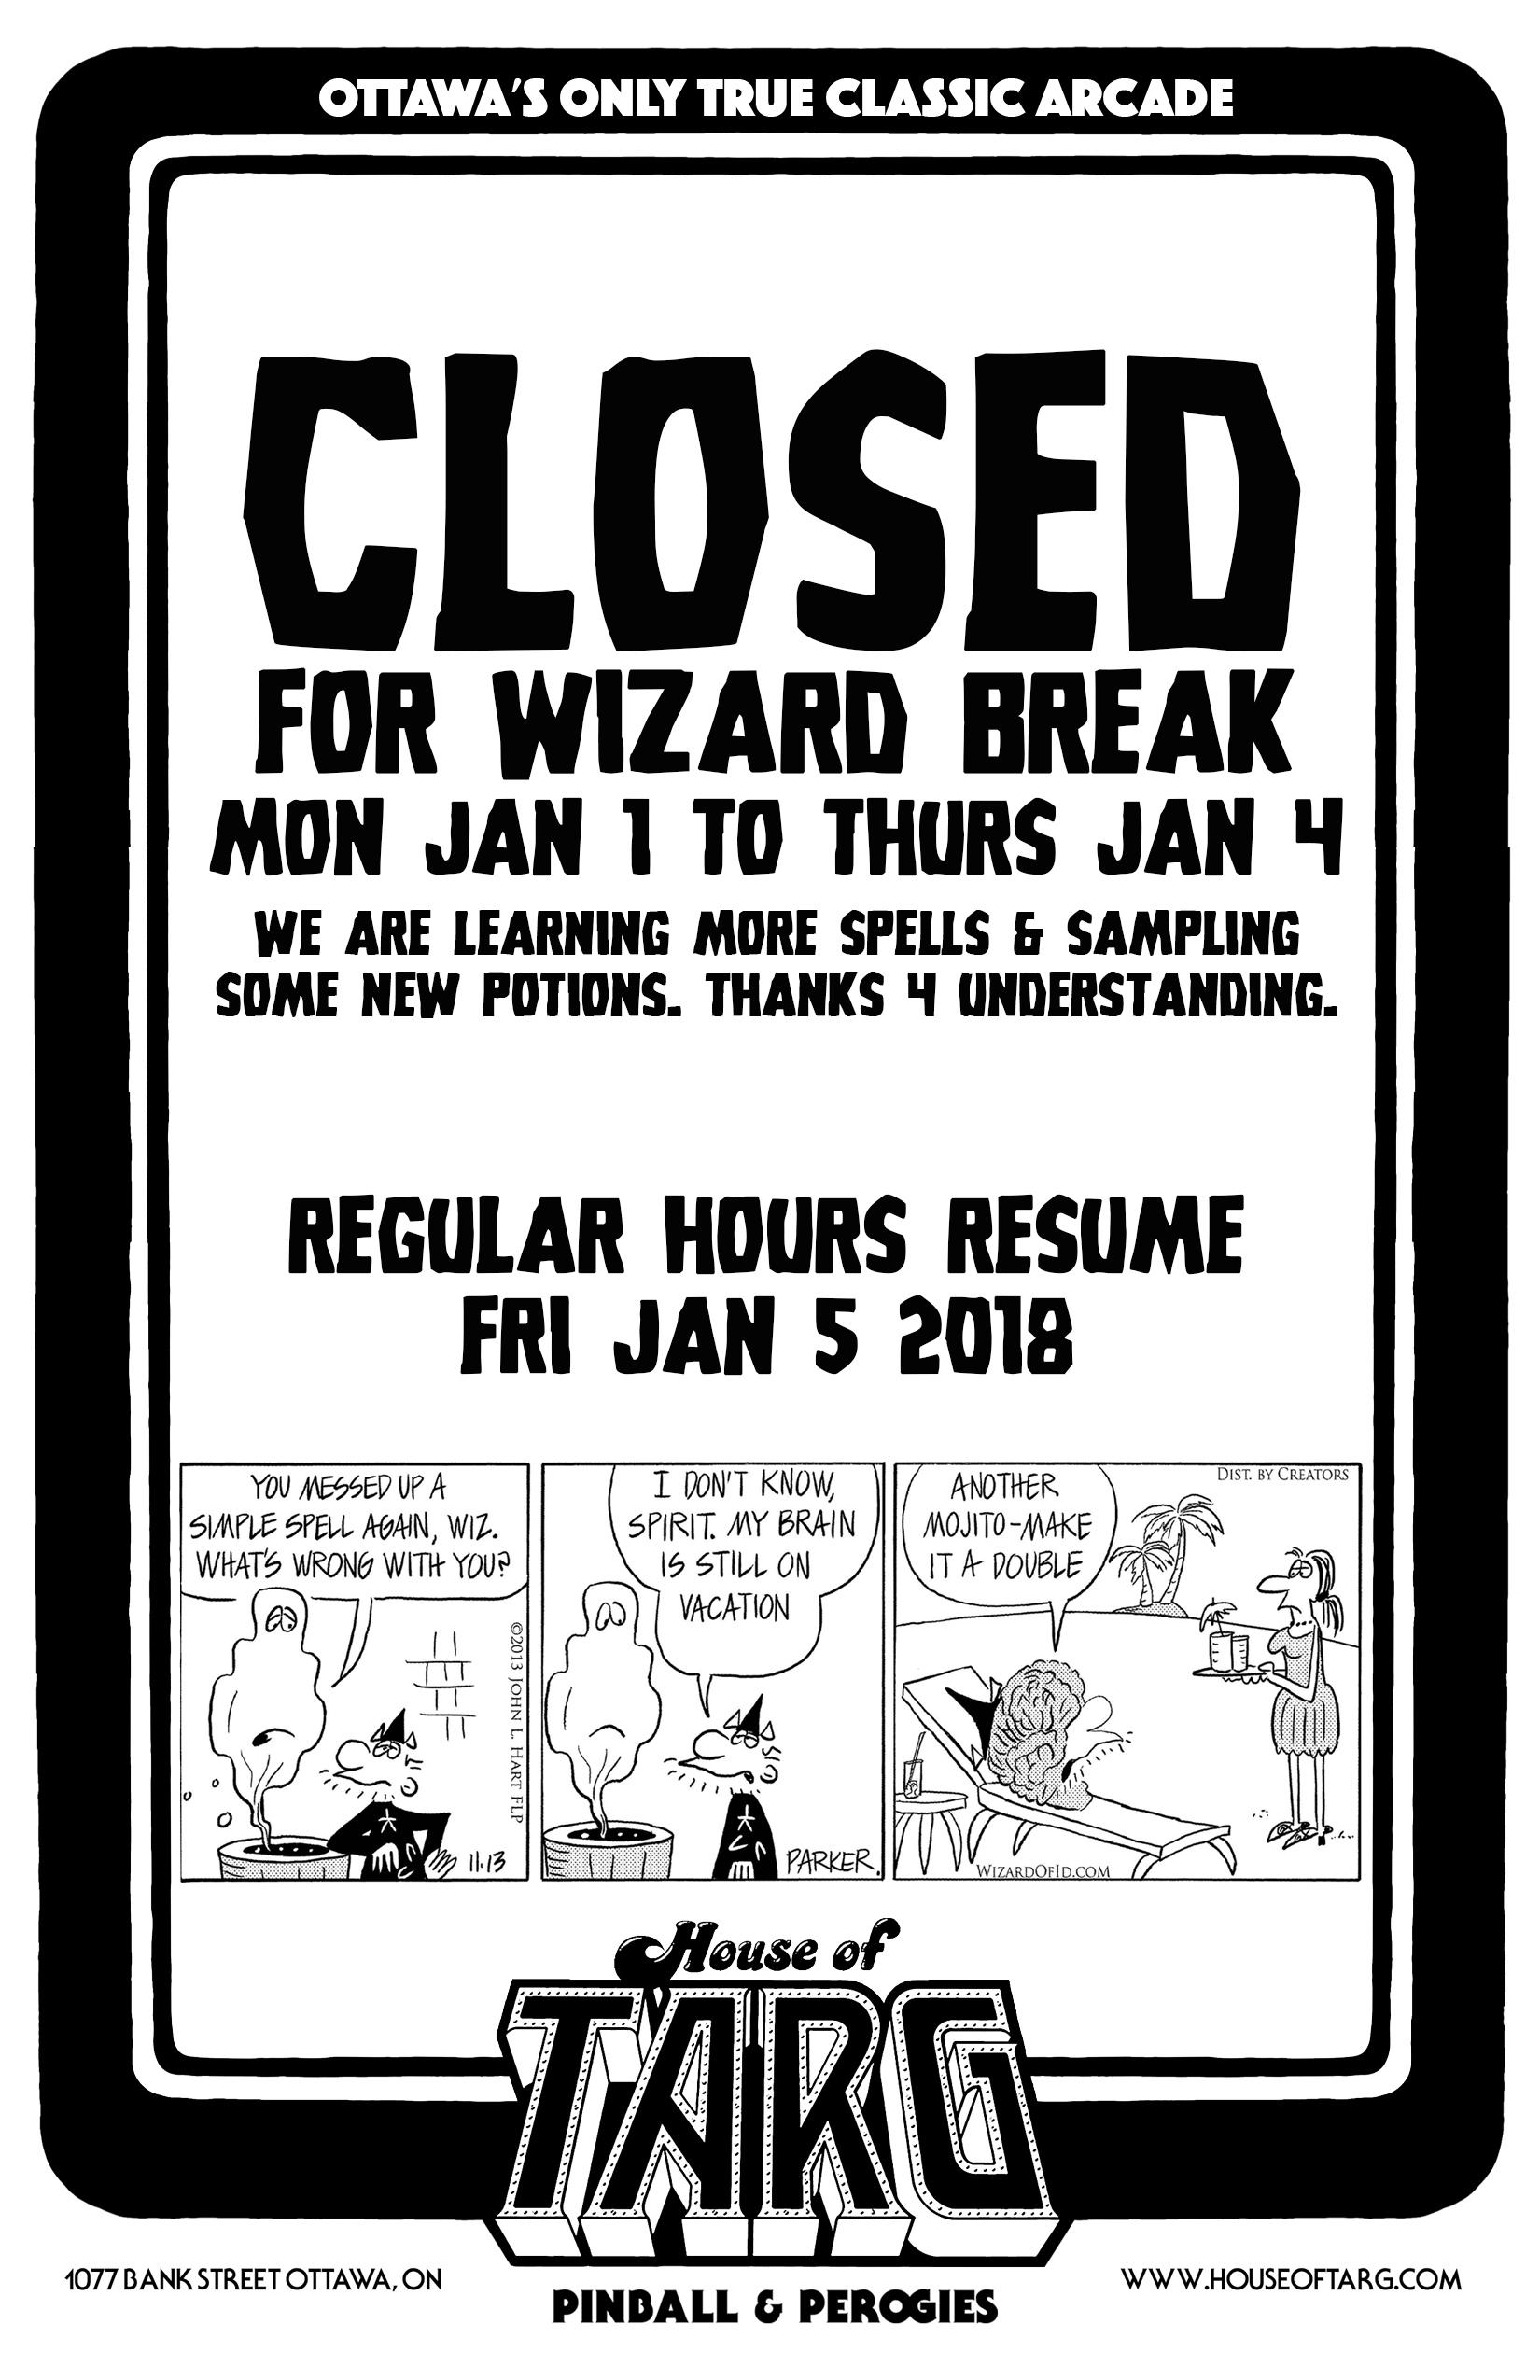 Closed Wizard Break 2018.jpg